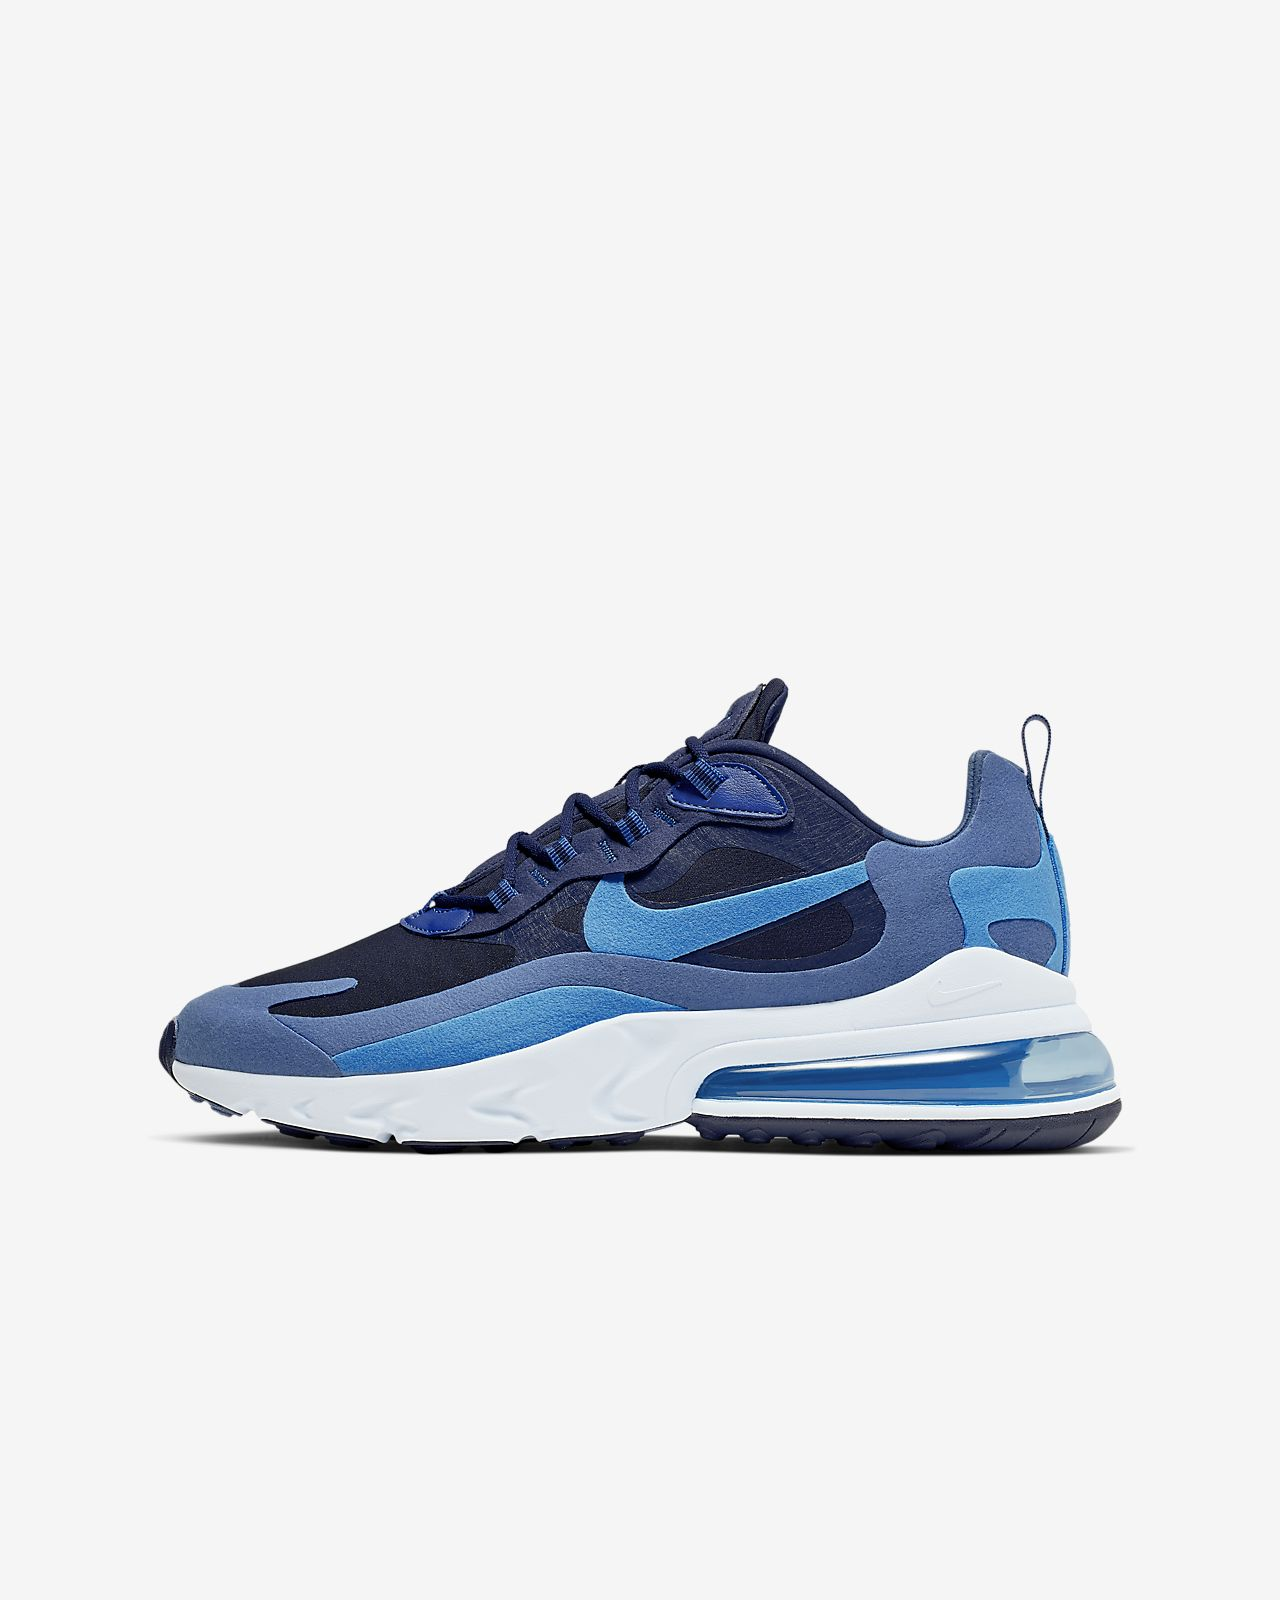 Nike Air Max 270 React (Impressionism Art) Men's Shoes